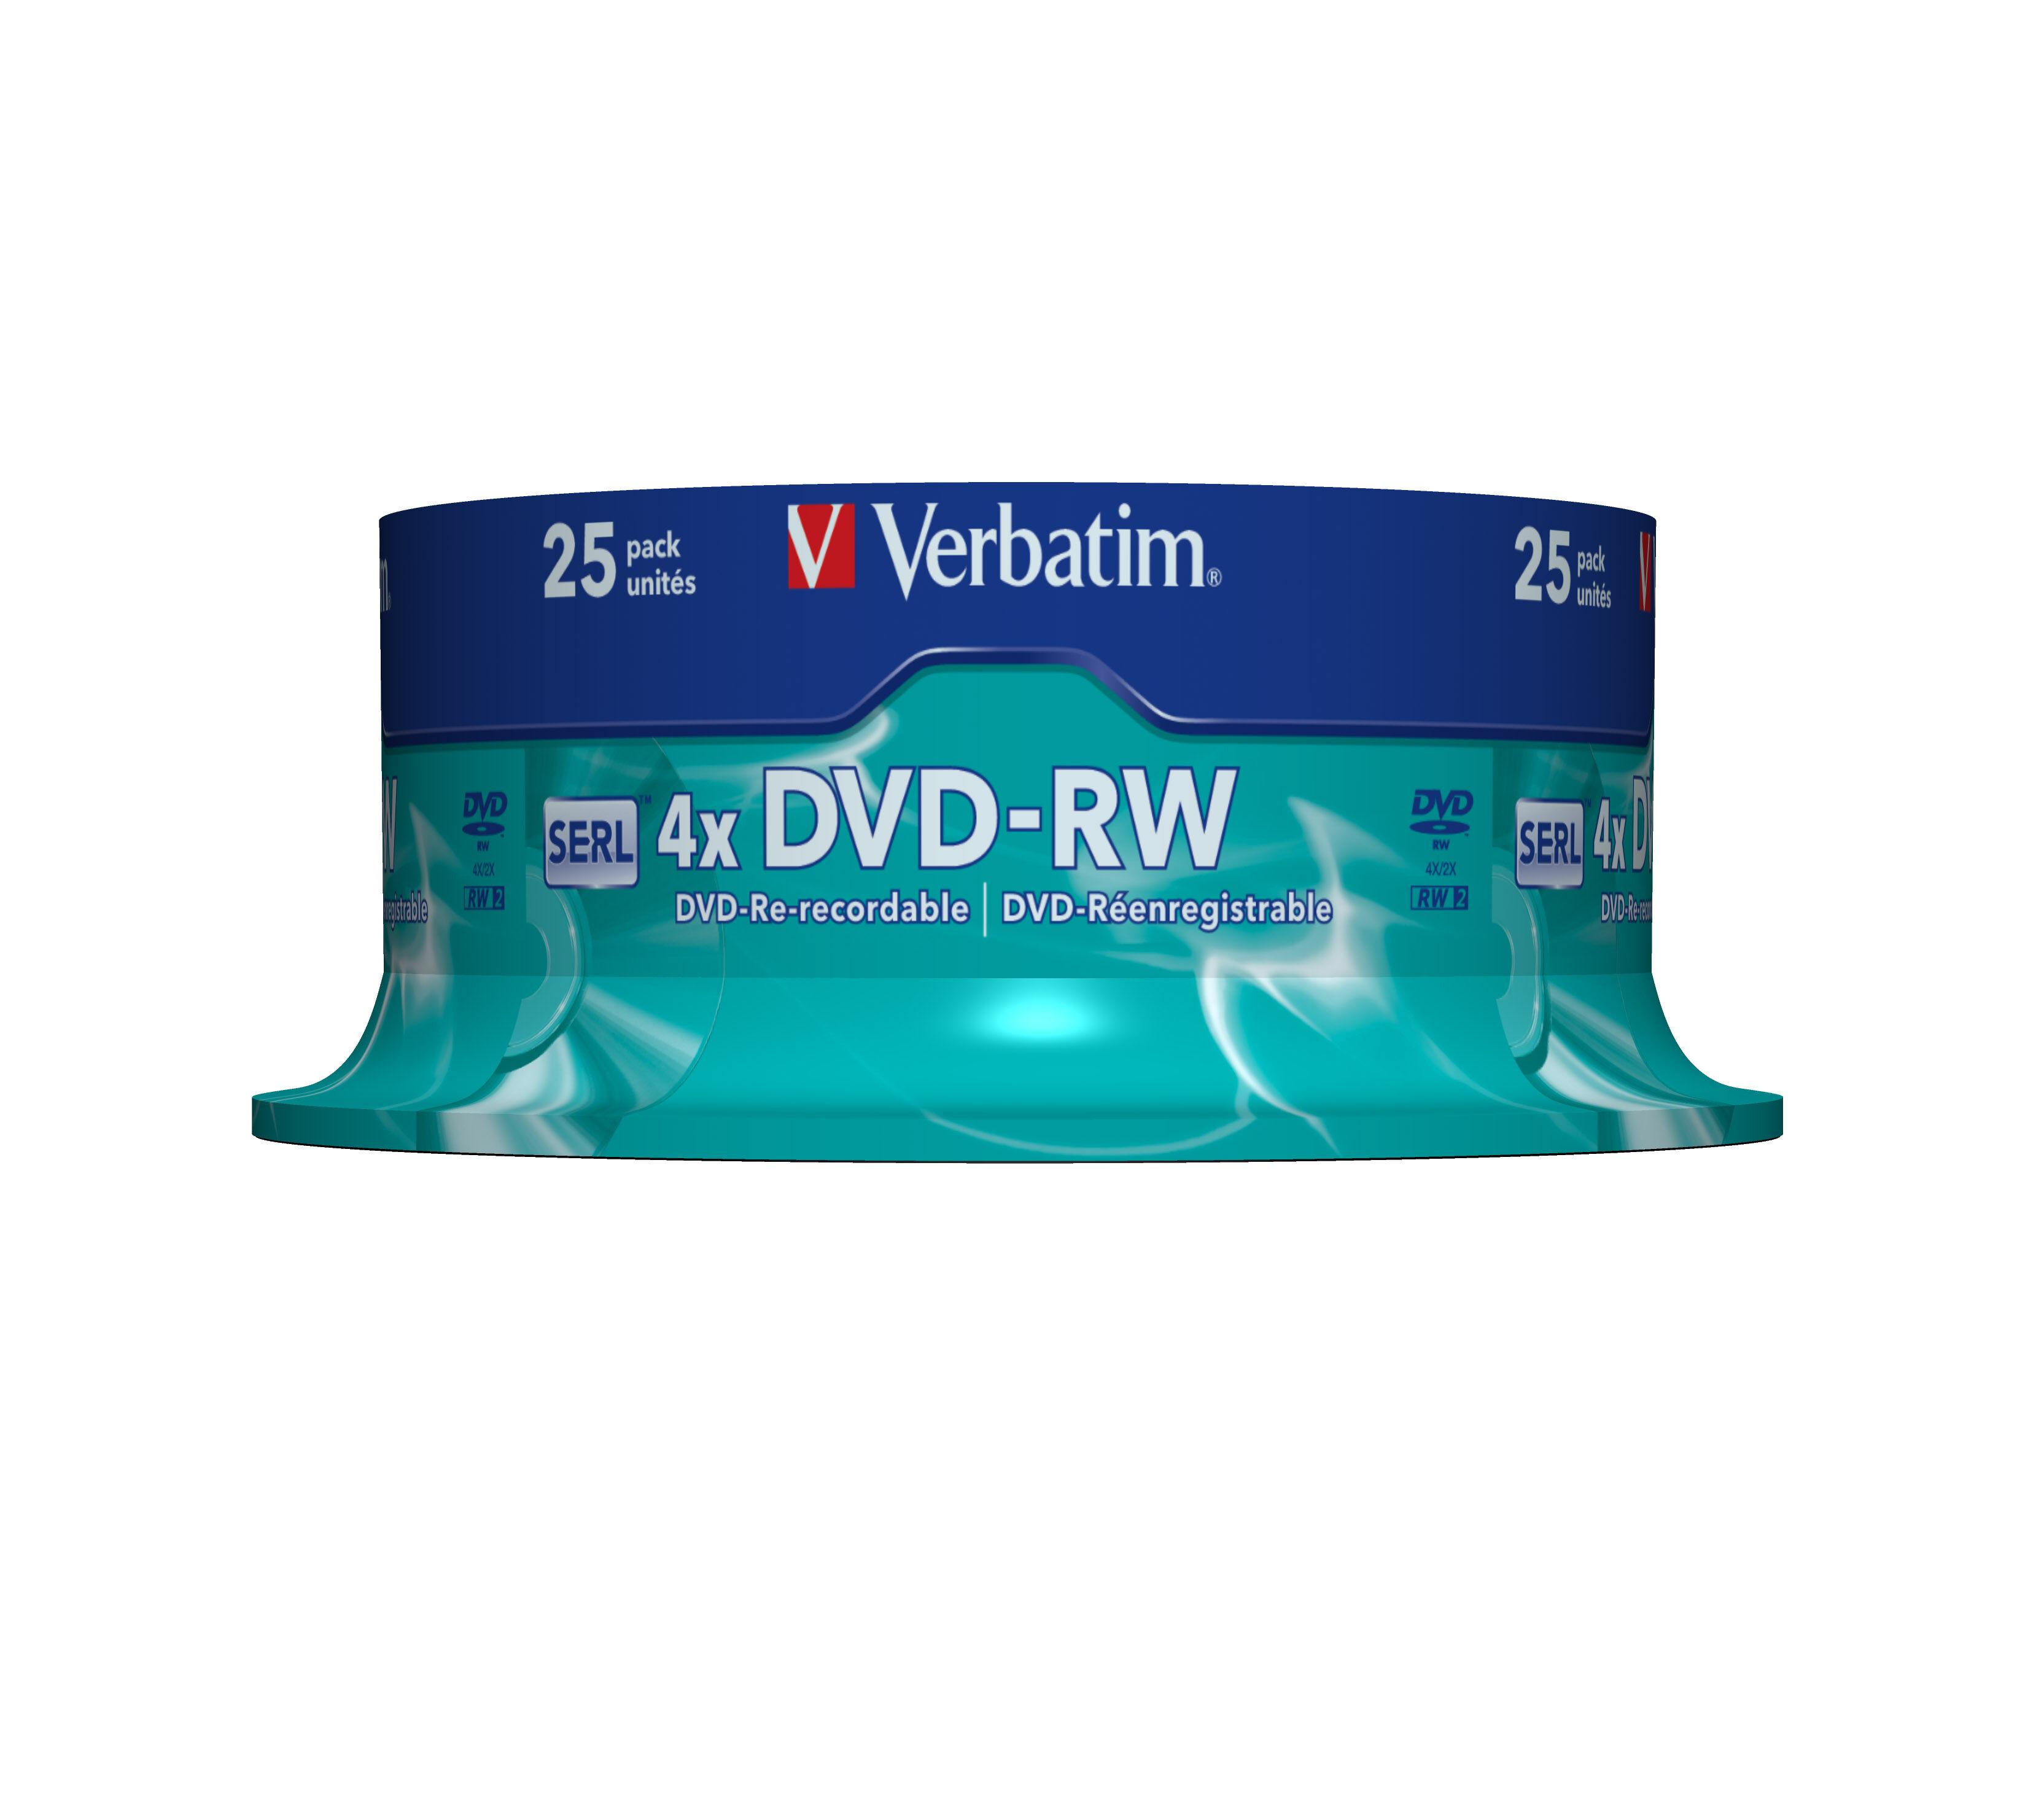 Verbatim DVD-RW, 4x, 4,7 GB/120 Min, 25-pakkaus Spindle, SERL